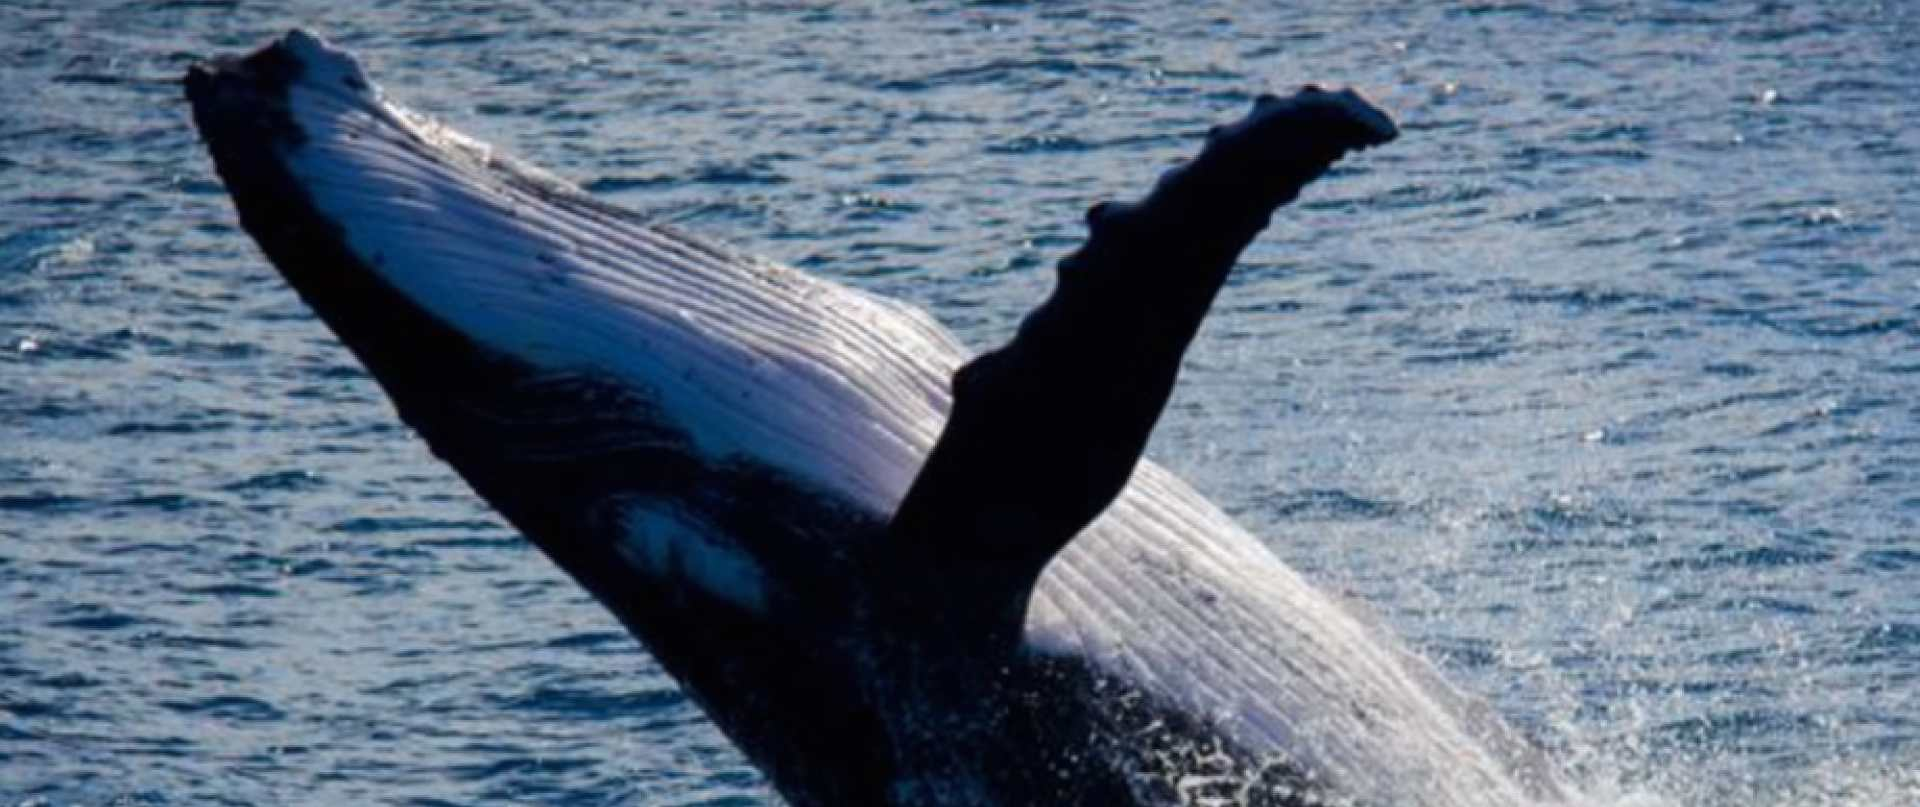 humpback-breach-crop.jpg.1920x807_default.jpg